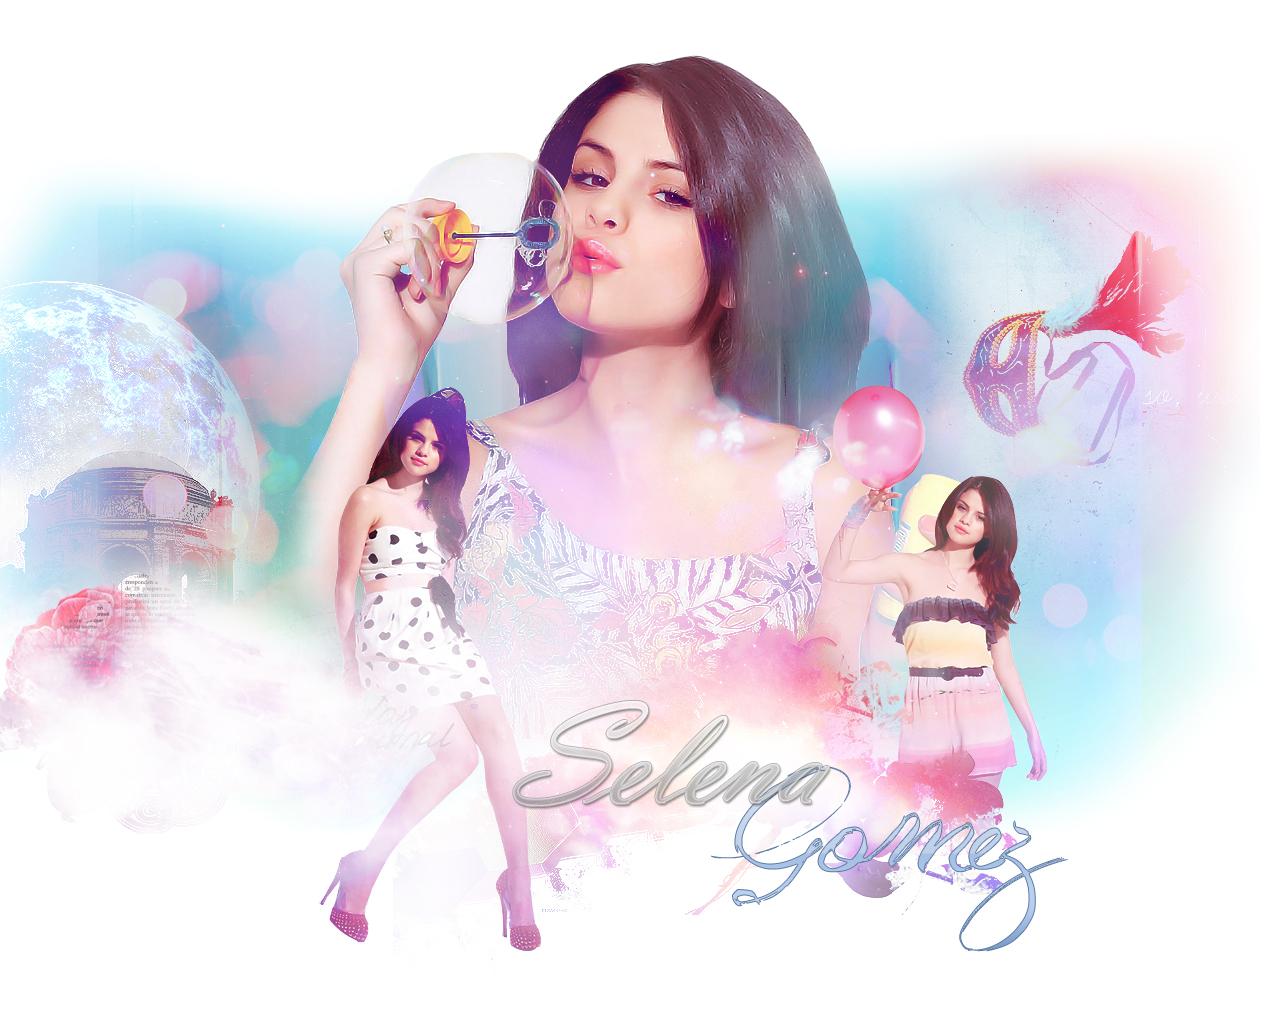 Selena Gomez Wallpapers SelenaWallpapers-selena-gomez-27884275-1280-1024